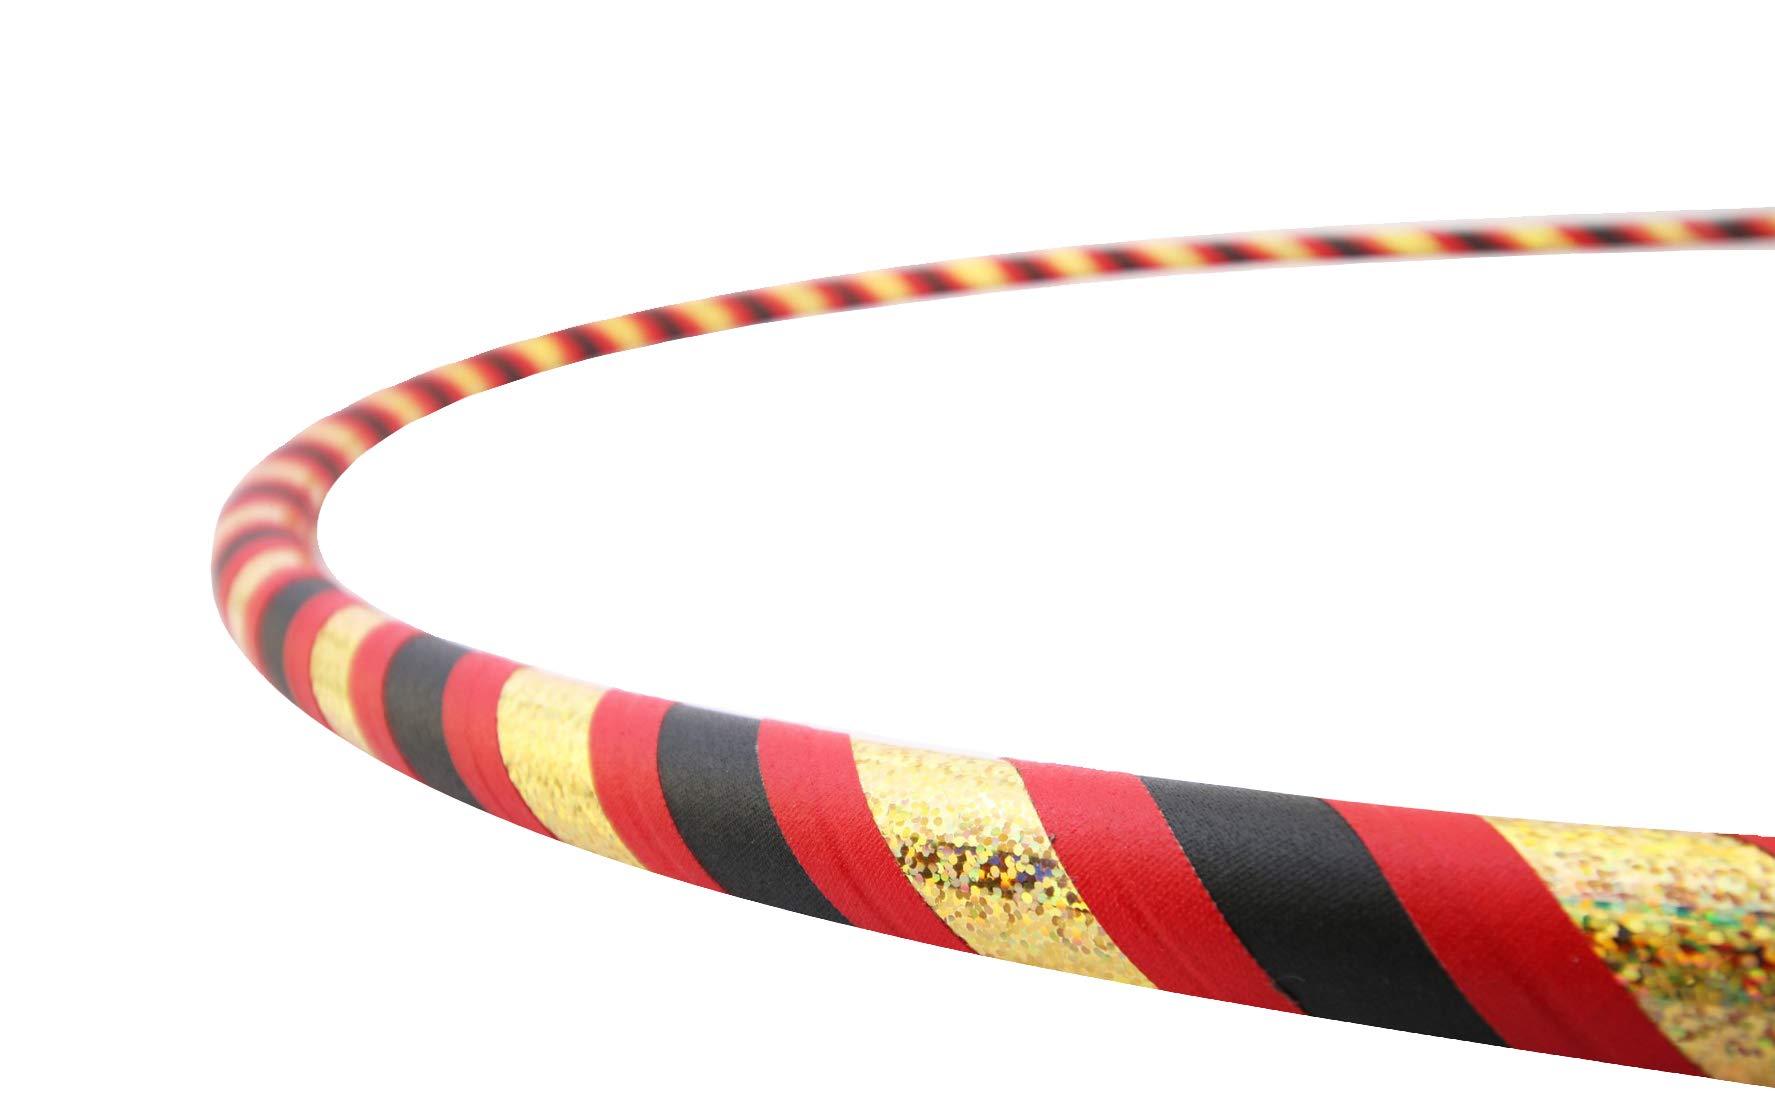 The Spinsterz Adult Beginner Hula Hoop (Ladybug, Small - 36'' Diameter)